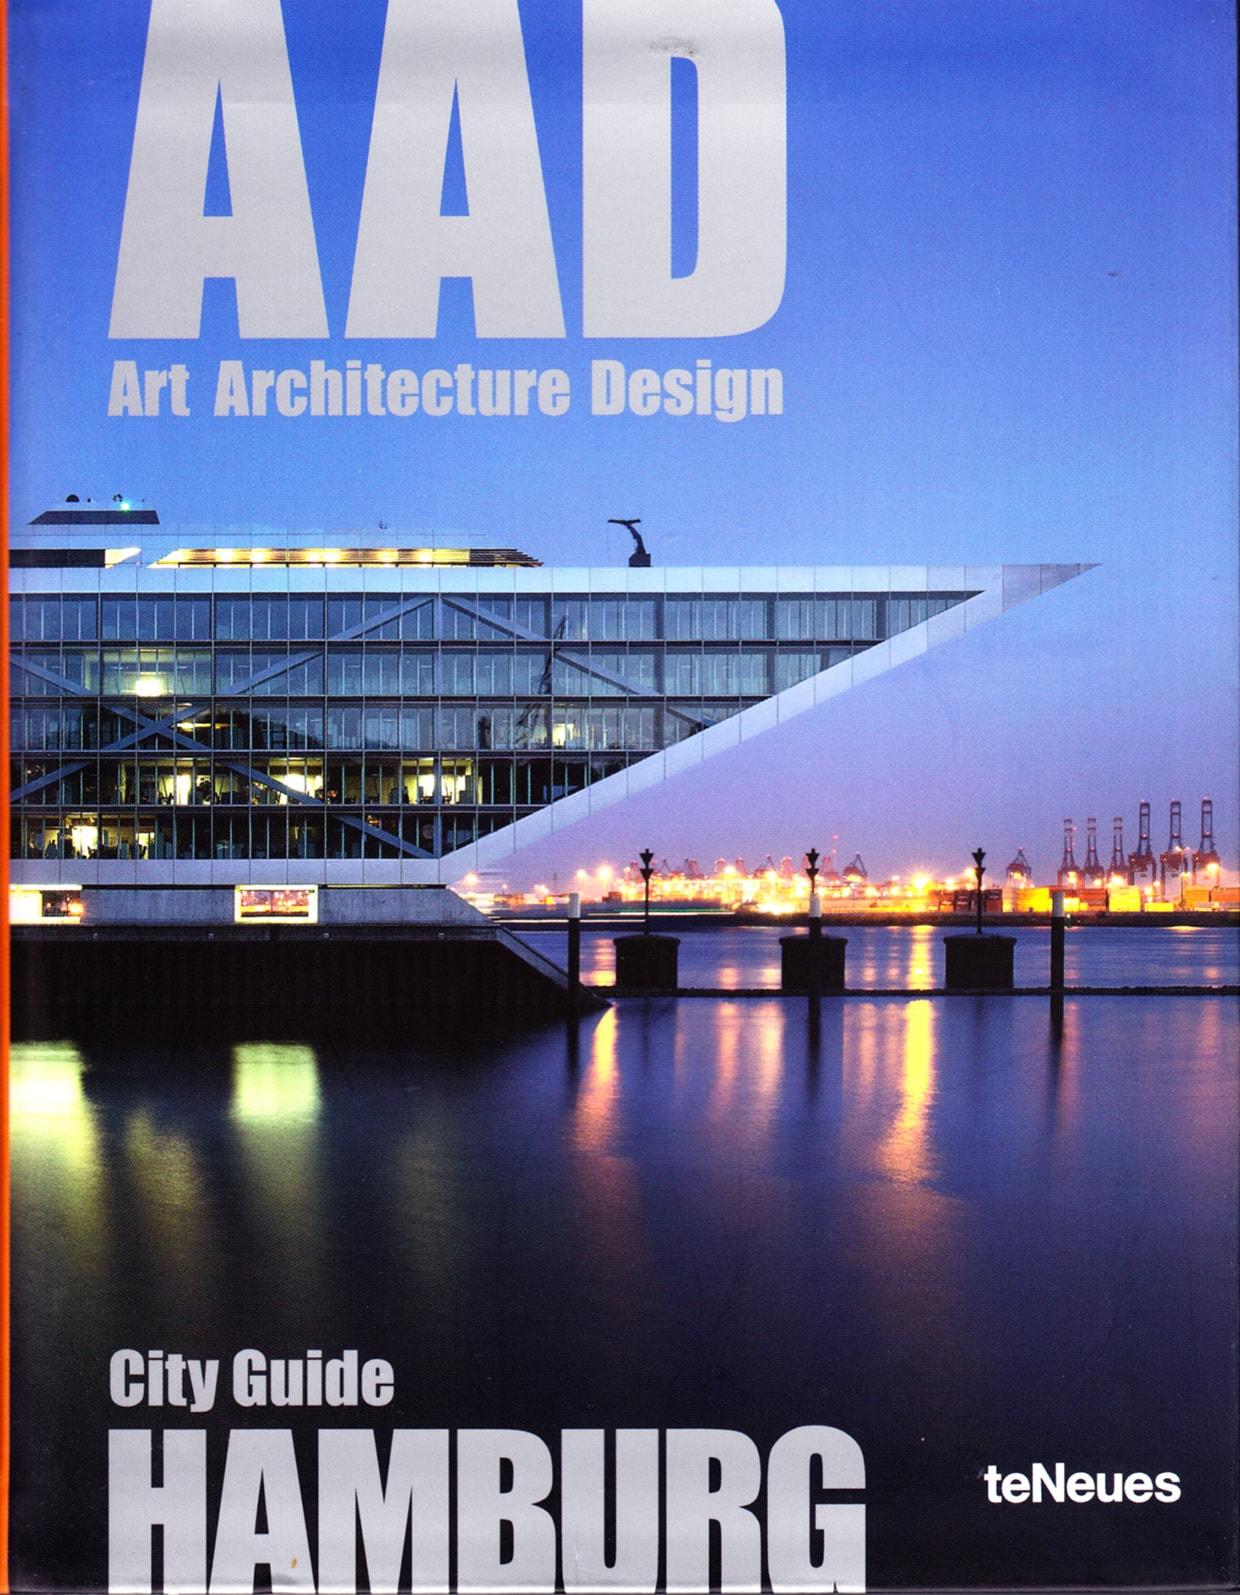 Art Architecture Design